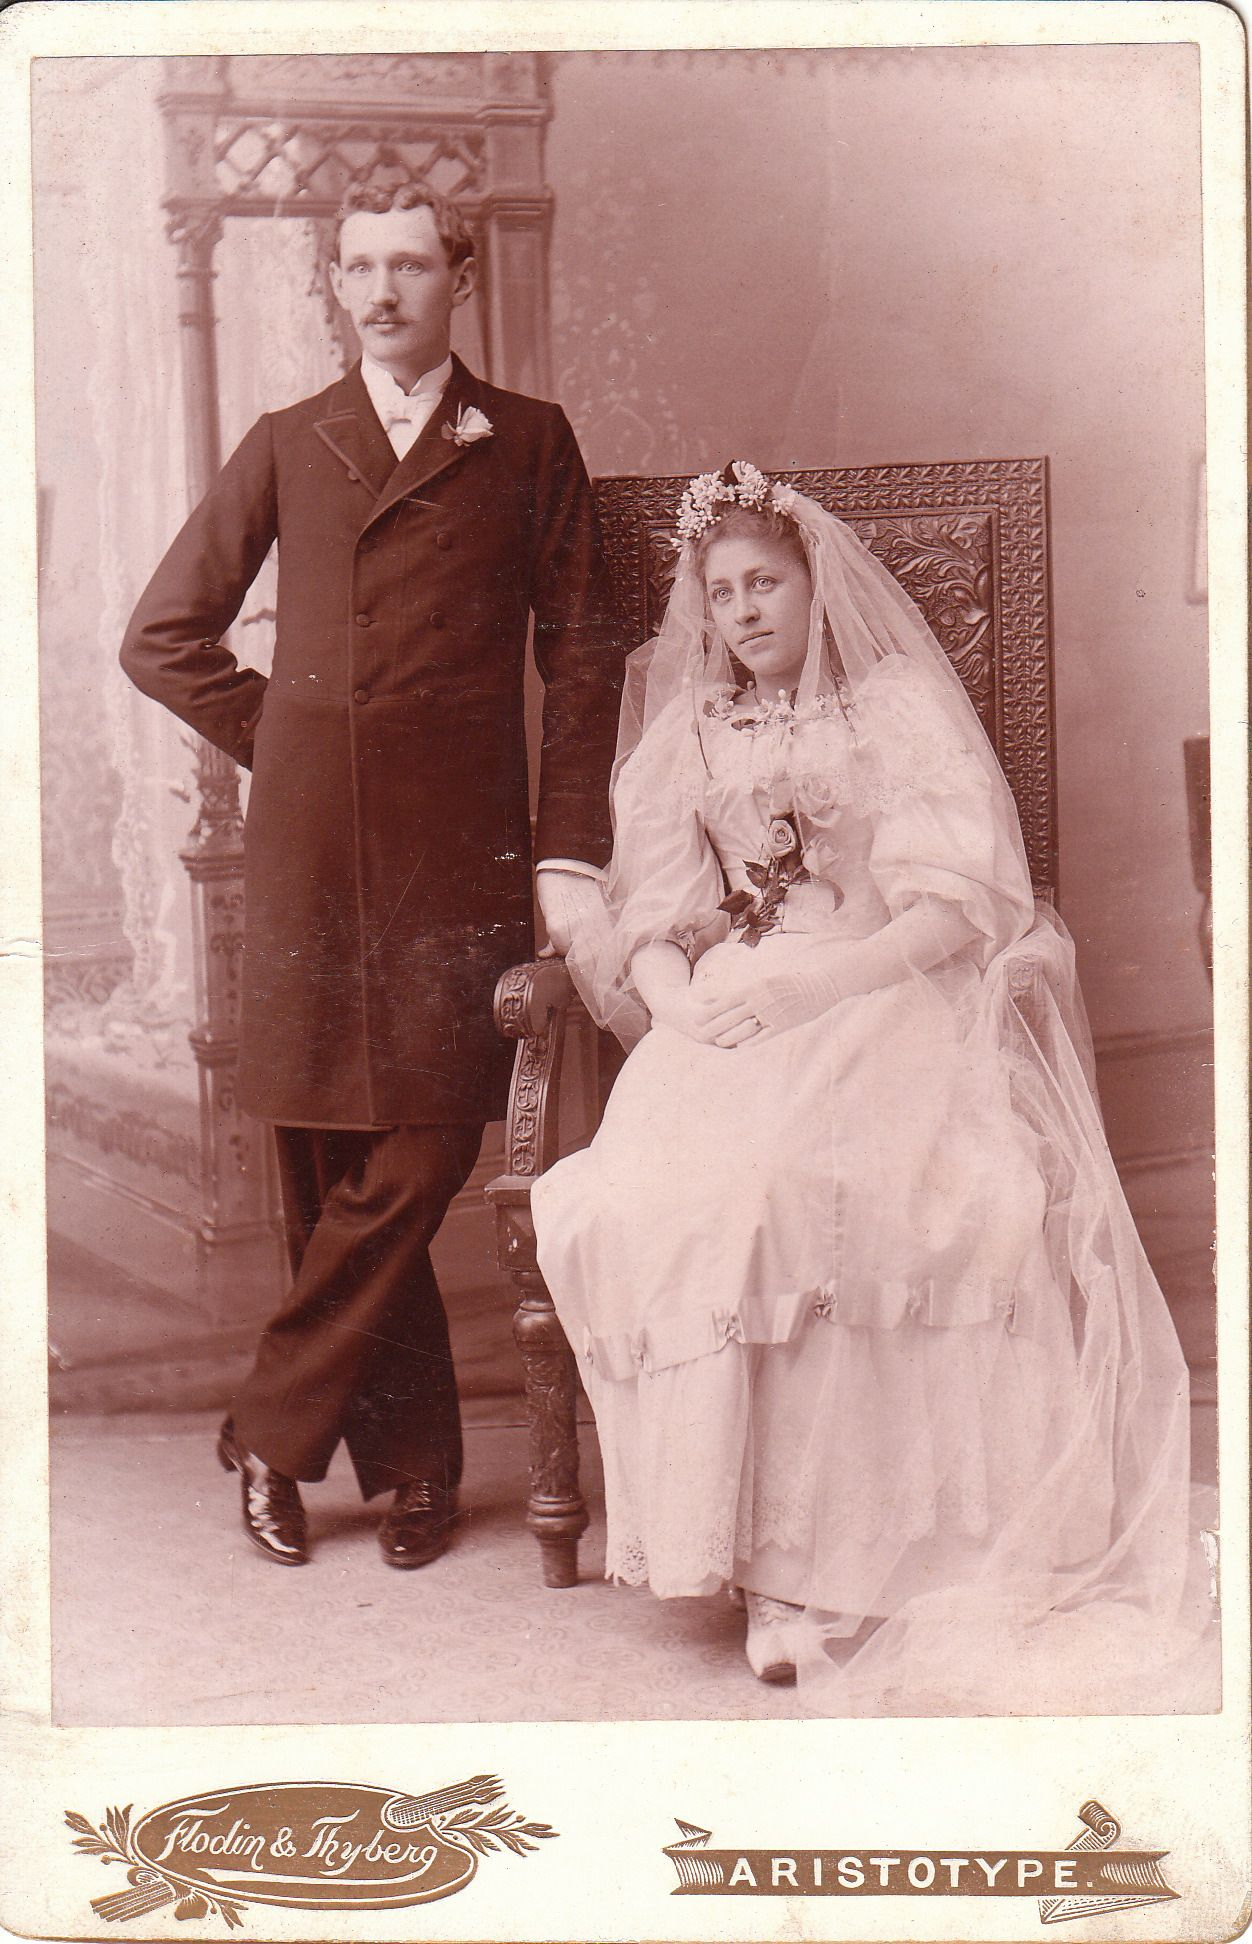 Fotografia antigua de boda | Cabinet Card Vintage | Pinterest ...